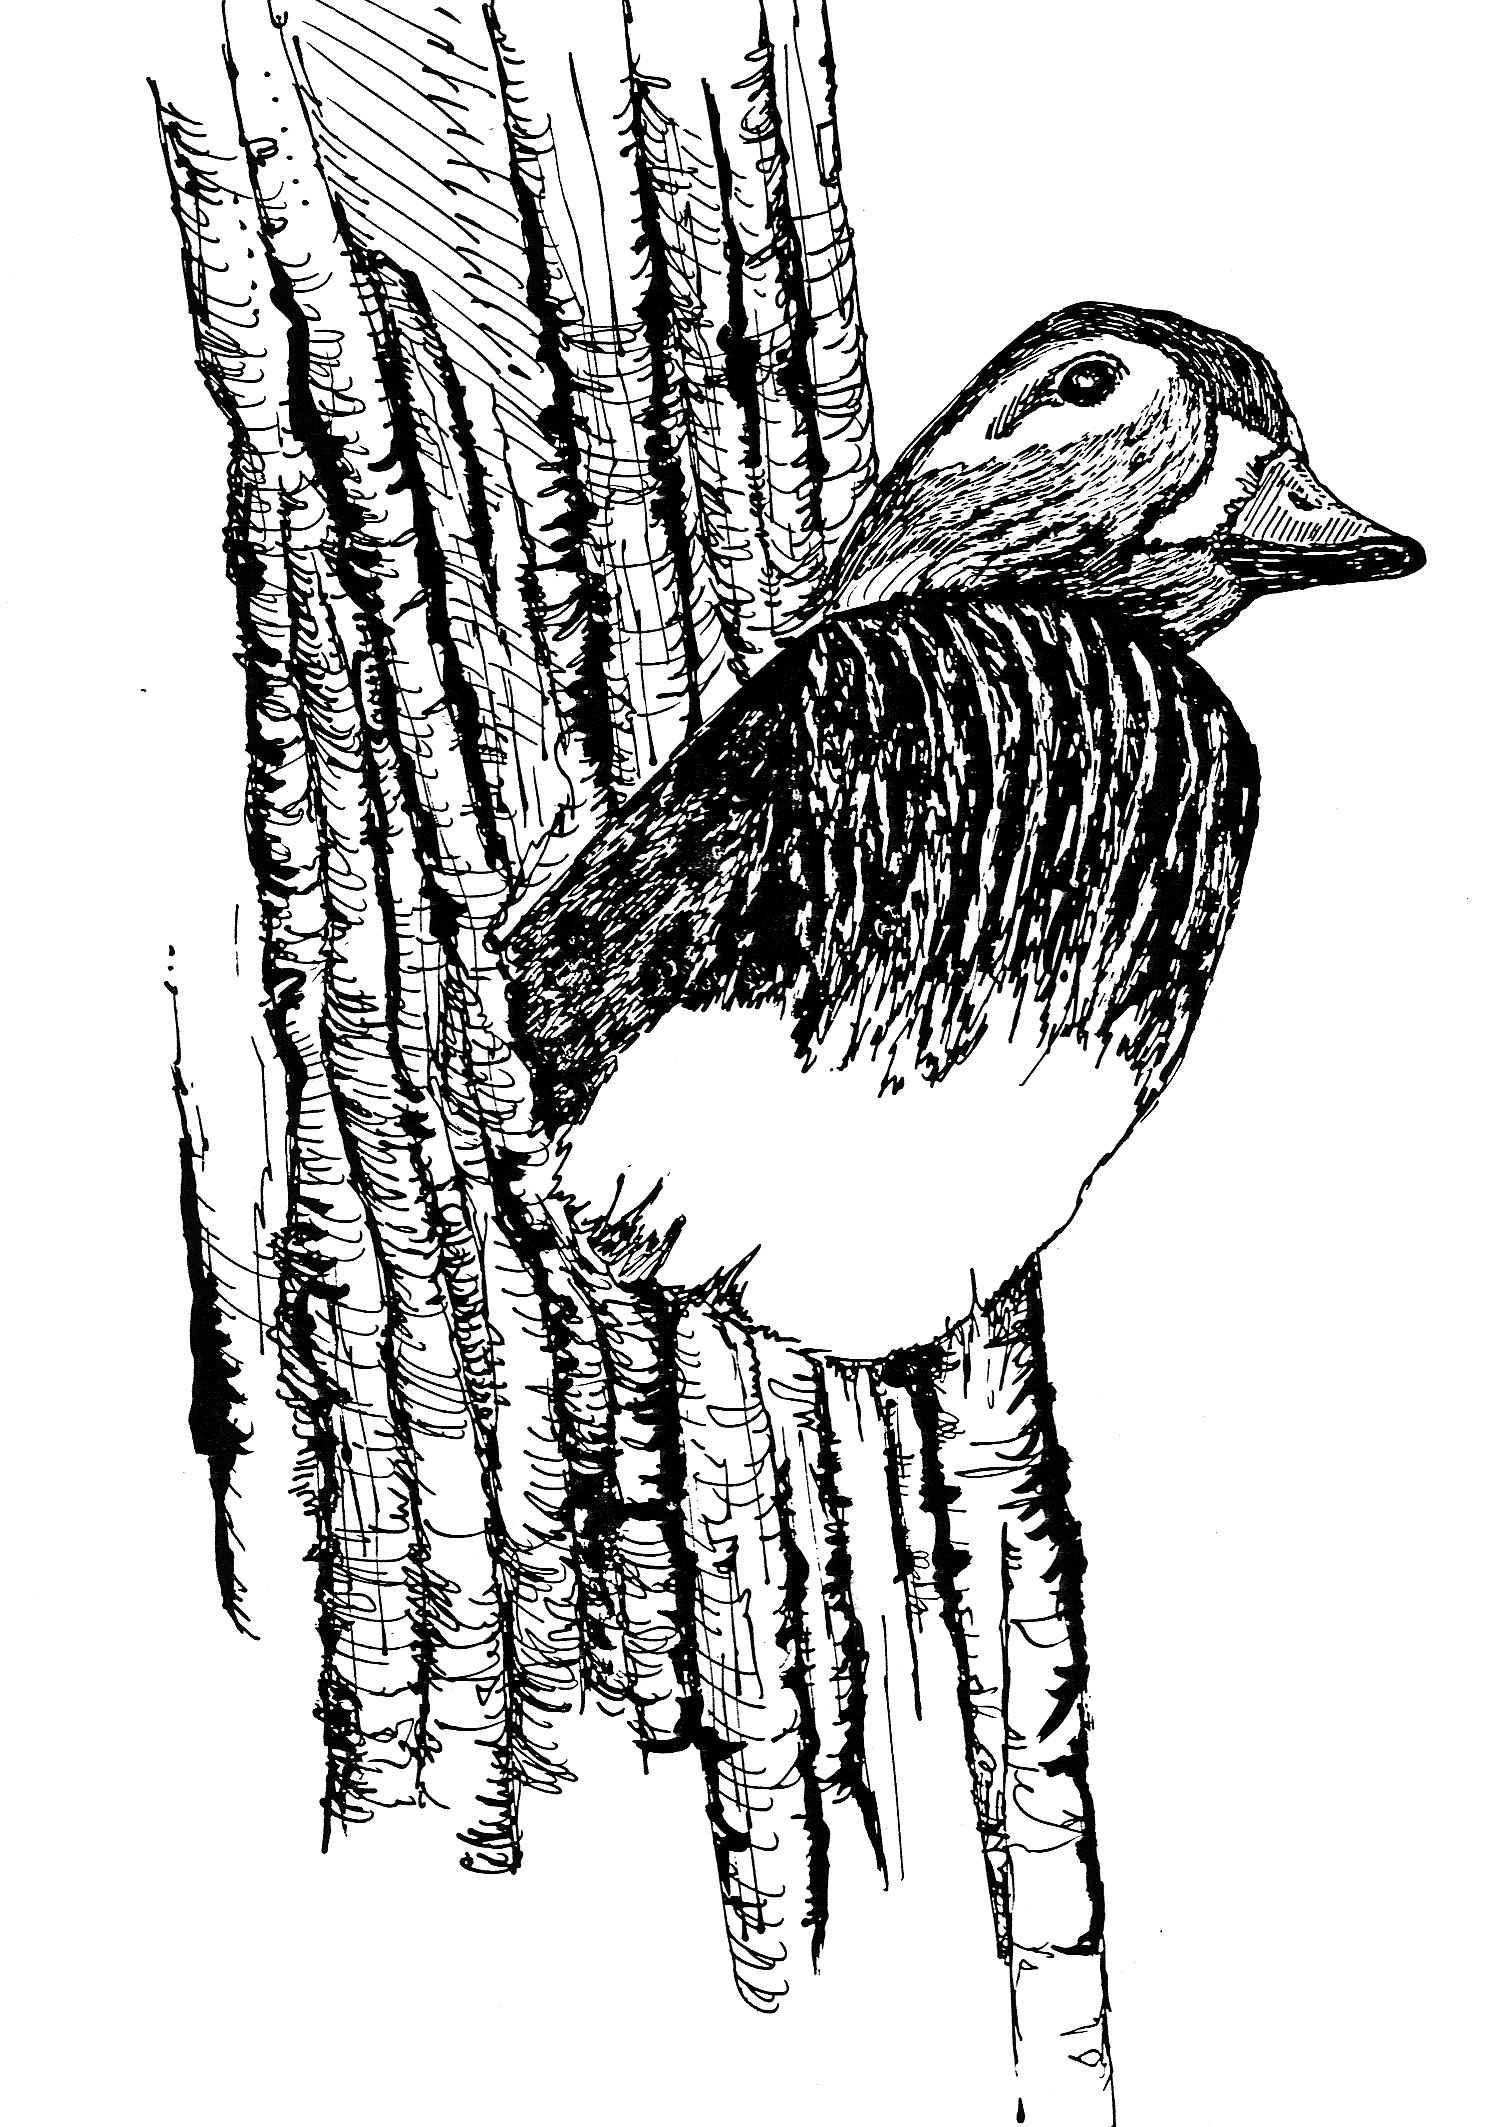 Line Art Duck : File line drawing art duck in nest g wikimedia commons